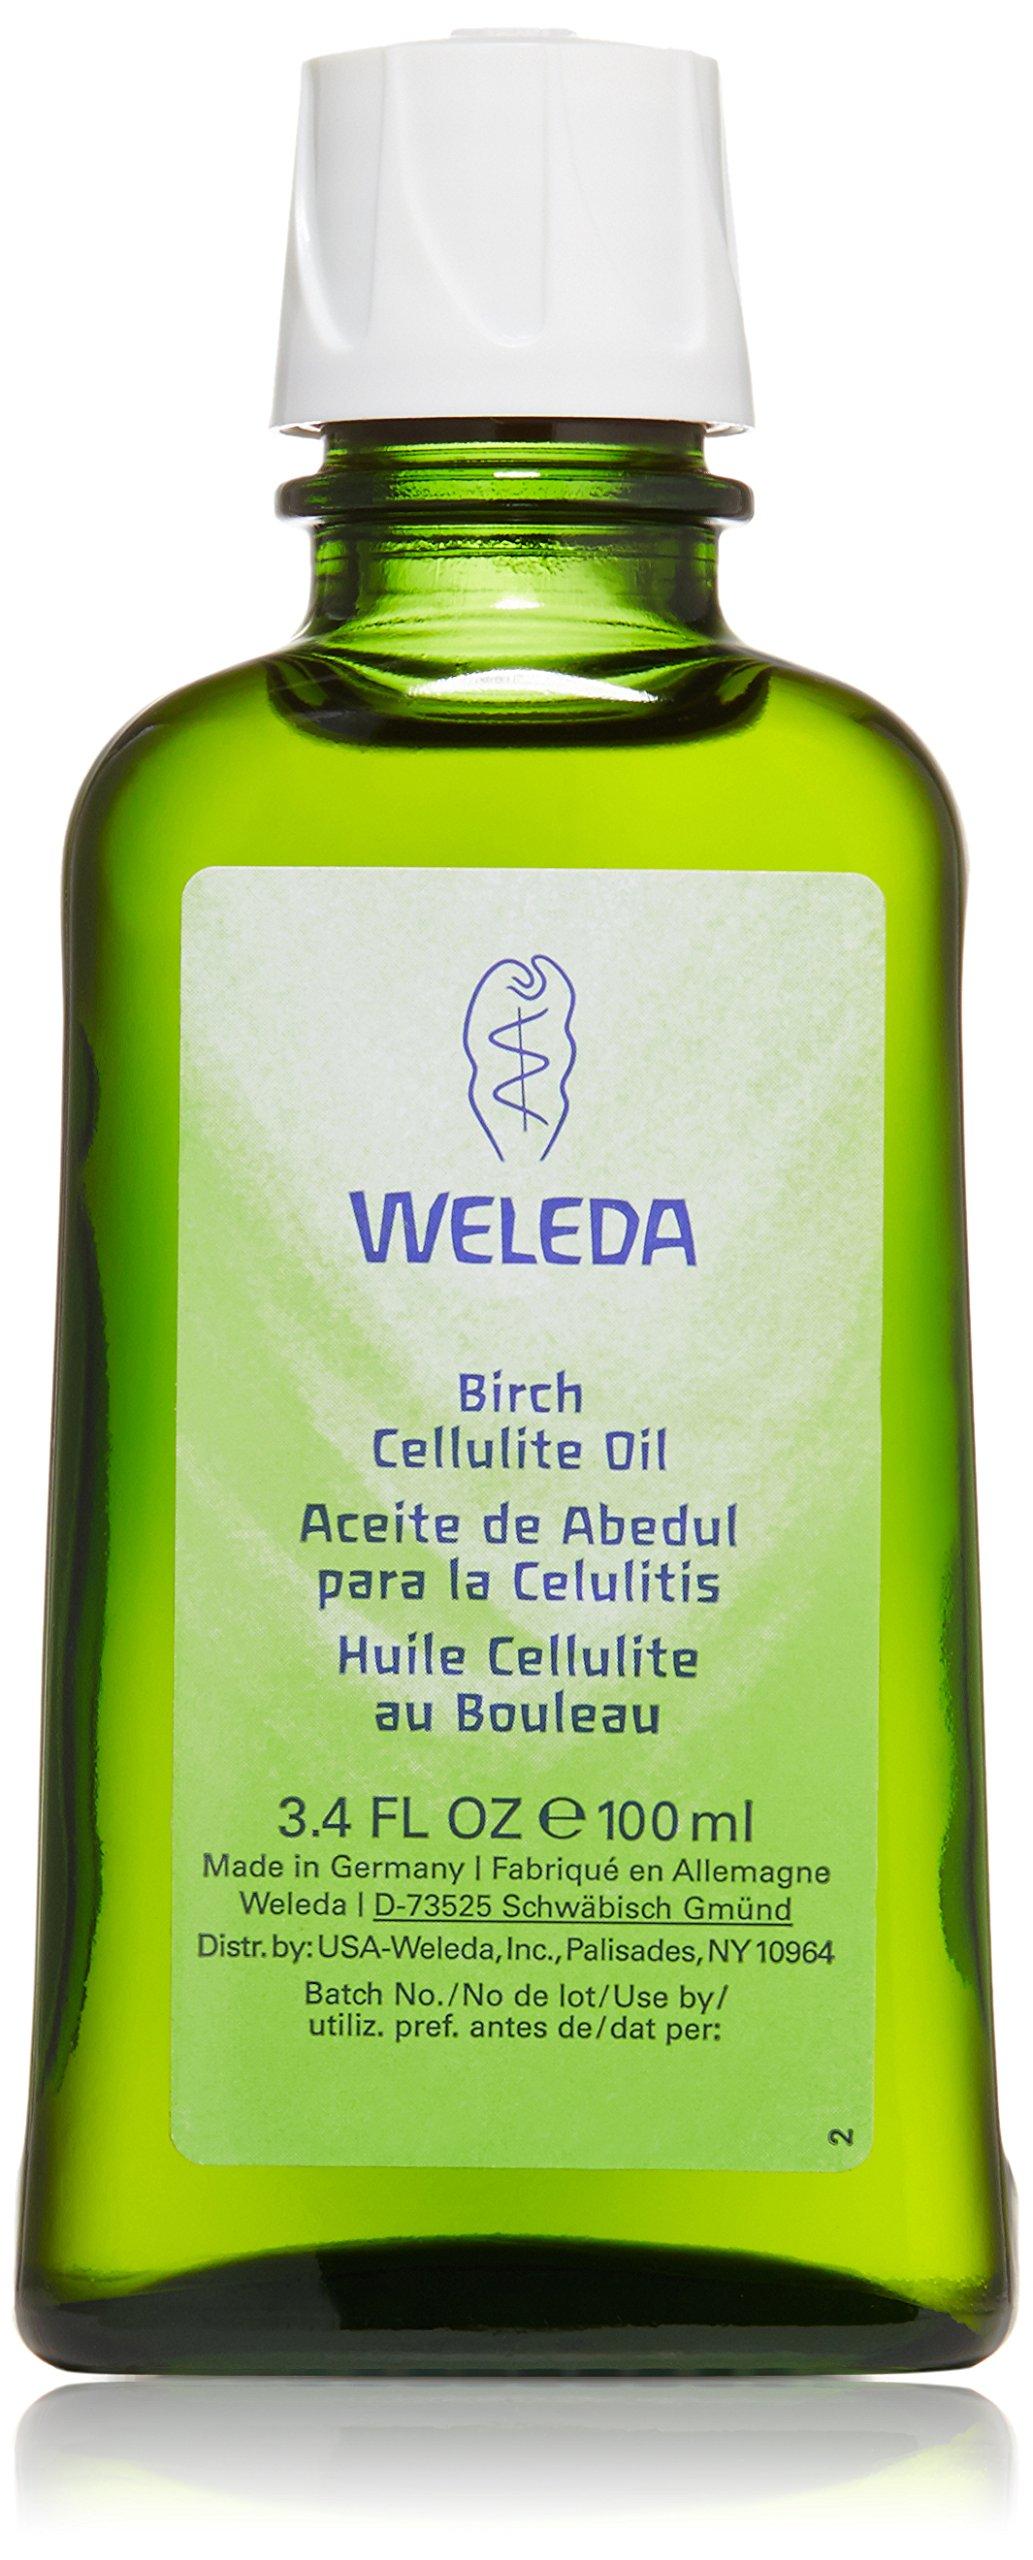 Weleda Birch Cellulite Oil, 3.4 Ounce